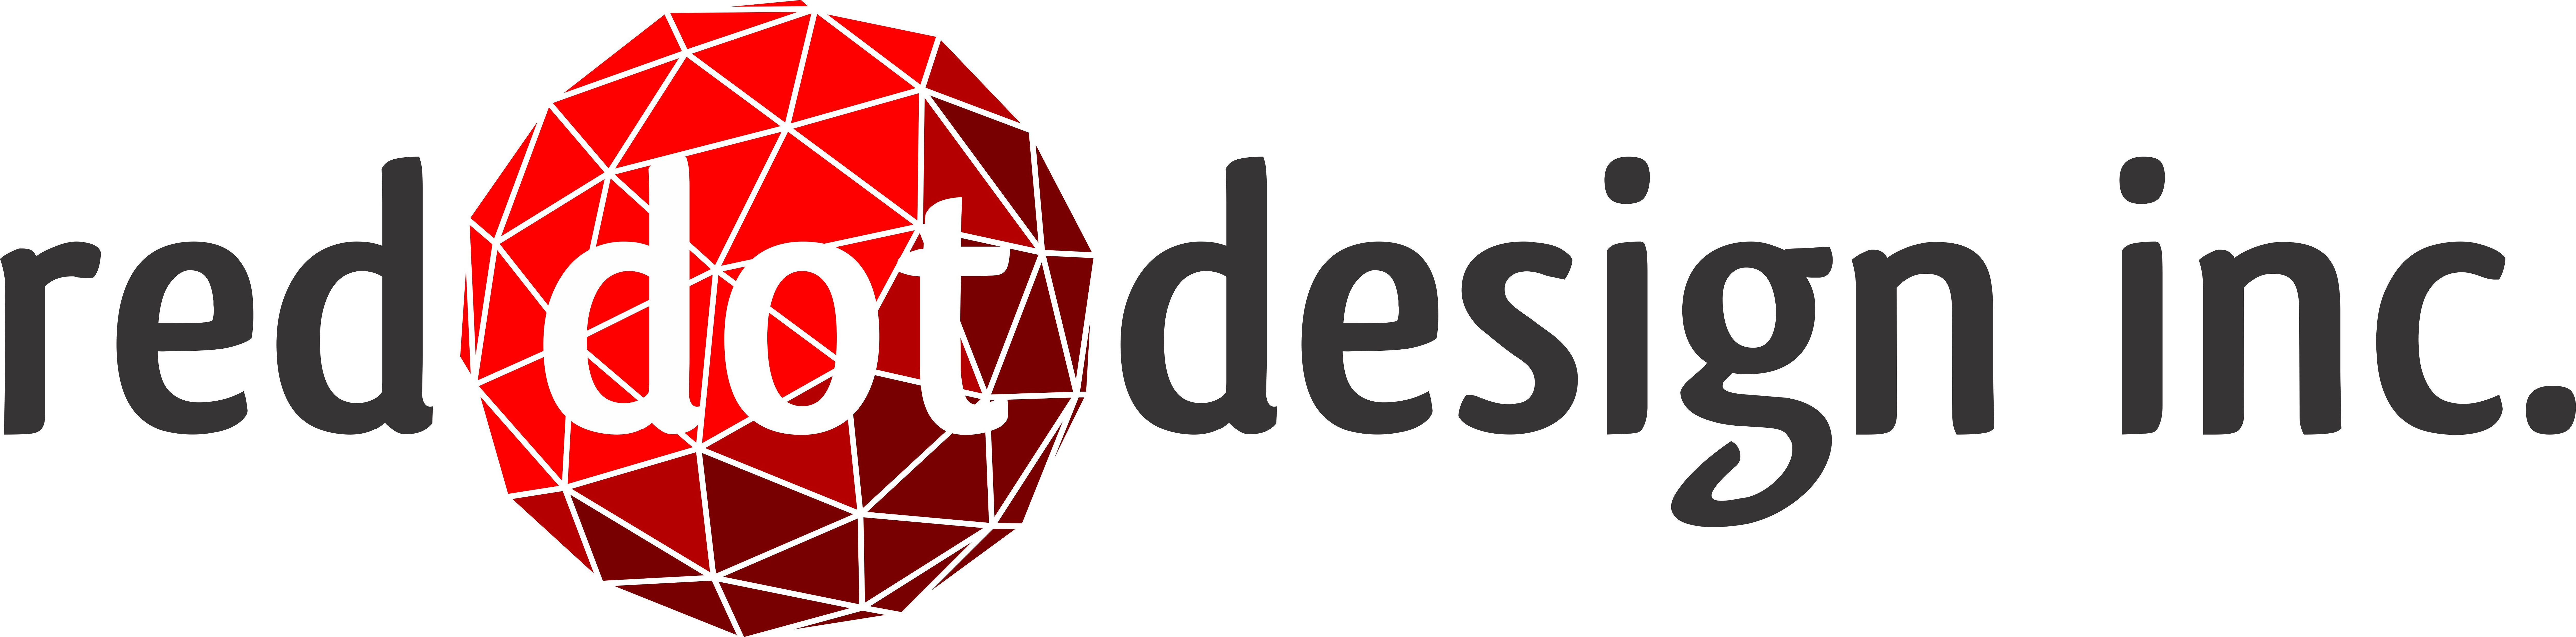 Red Dot Design Inc.